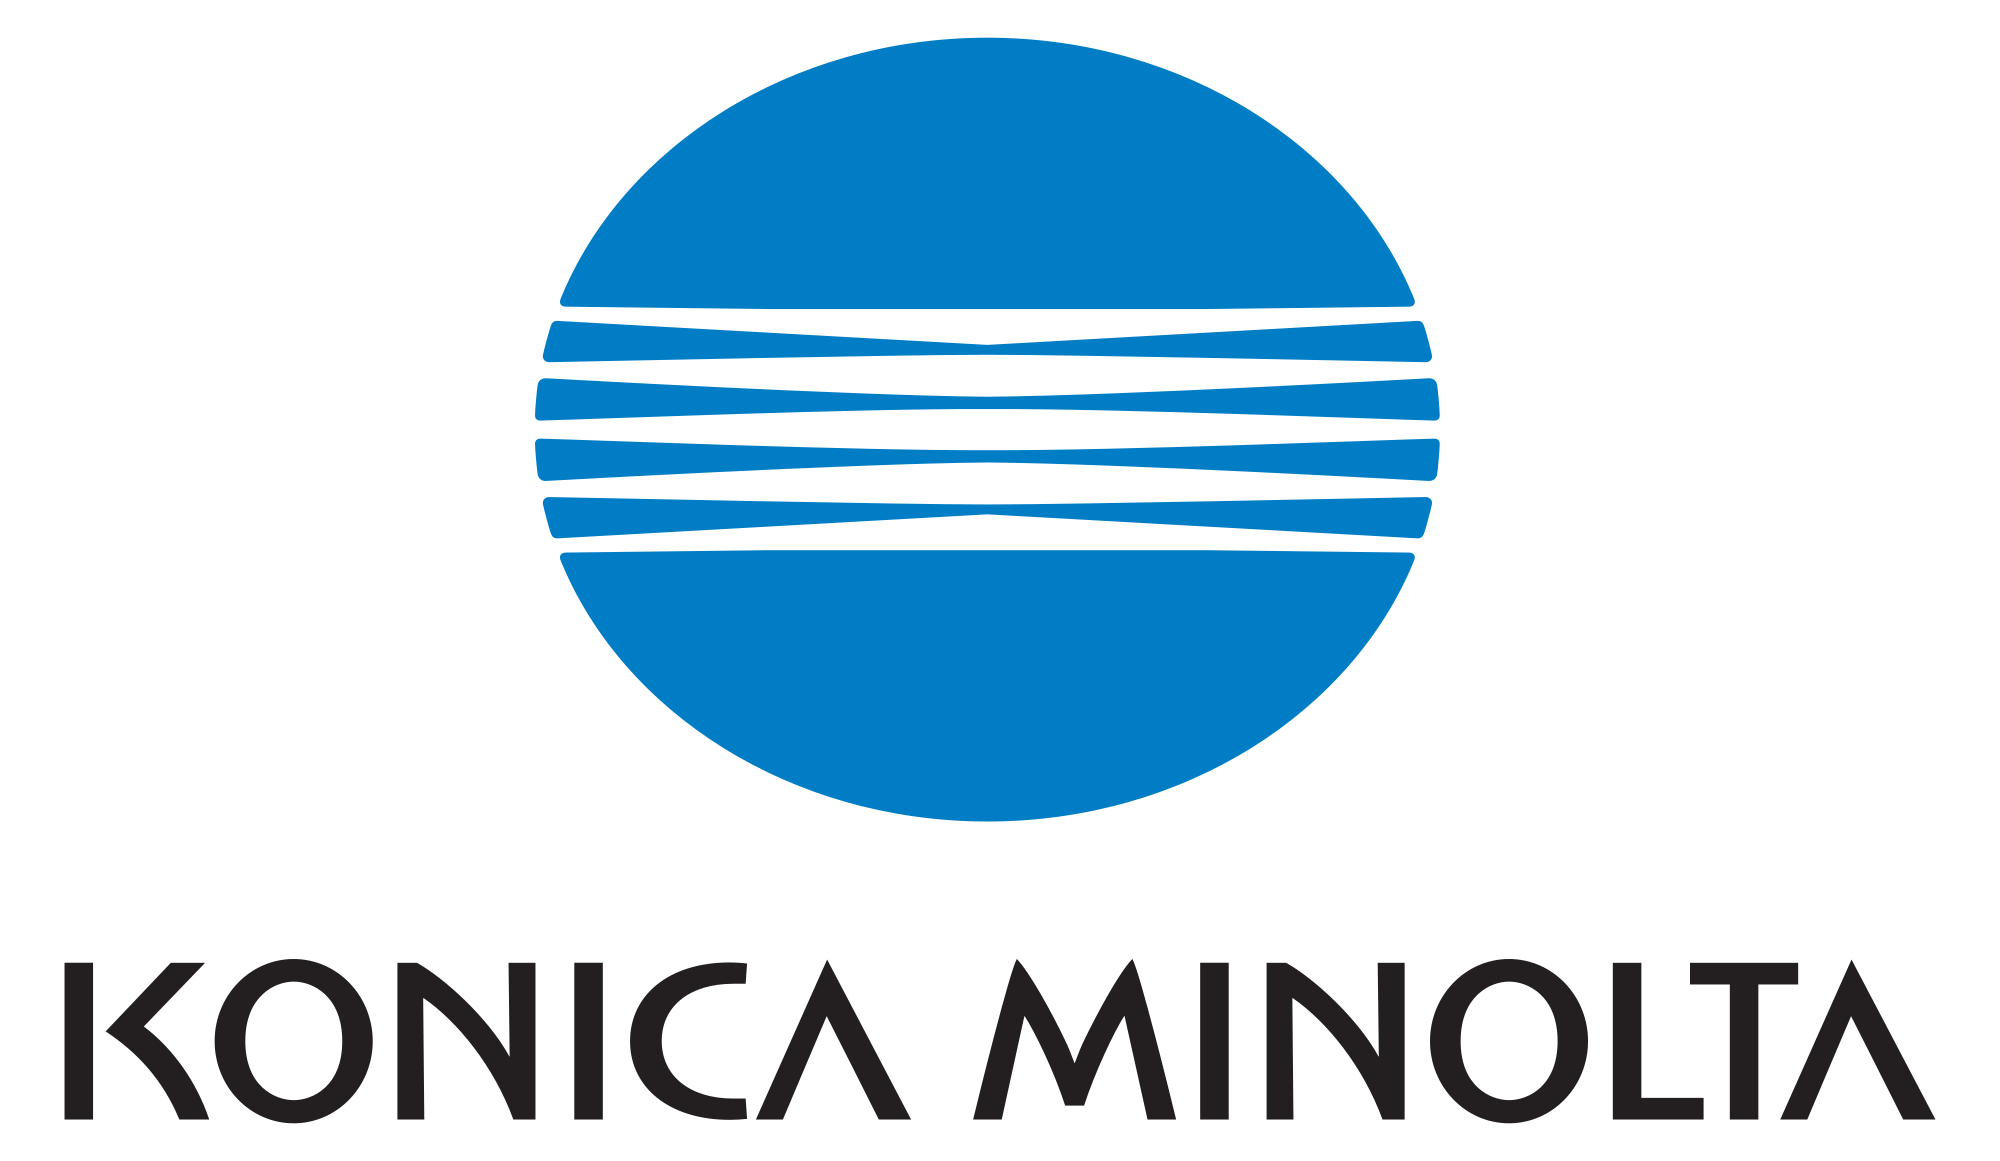 konica minolta prolonge avec la f233d233ration internationale